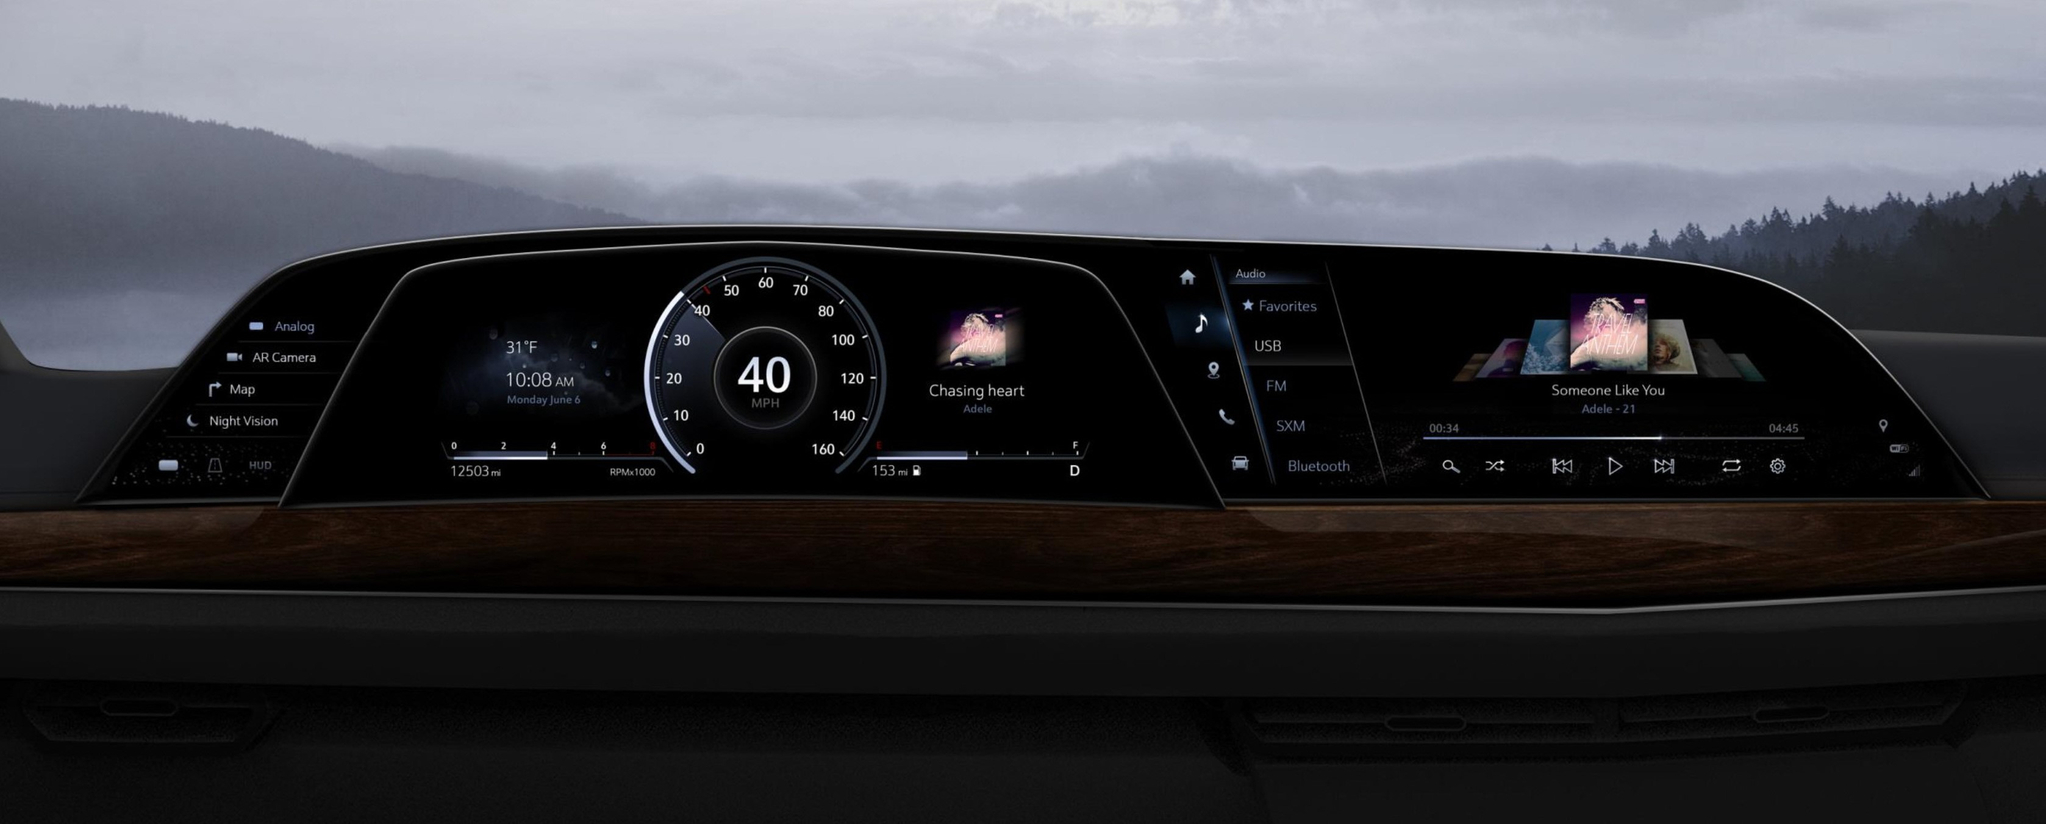 LG전자가 공급하는 2021년형 캐딜락 '에스컬레이드' 차량의 디지털 콕핏 시스템 [사진 LG전자]